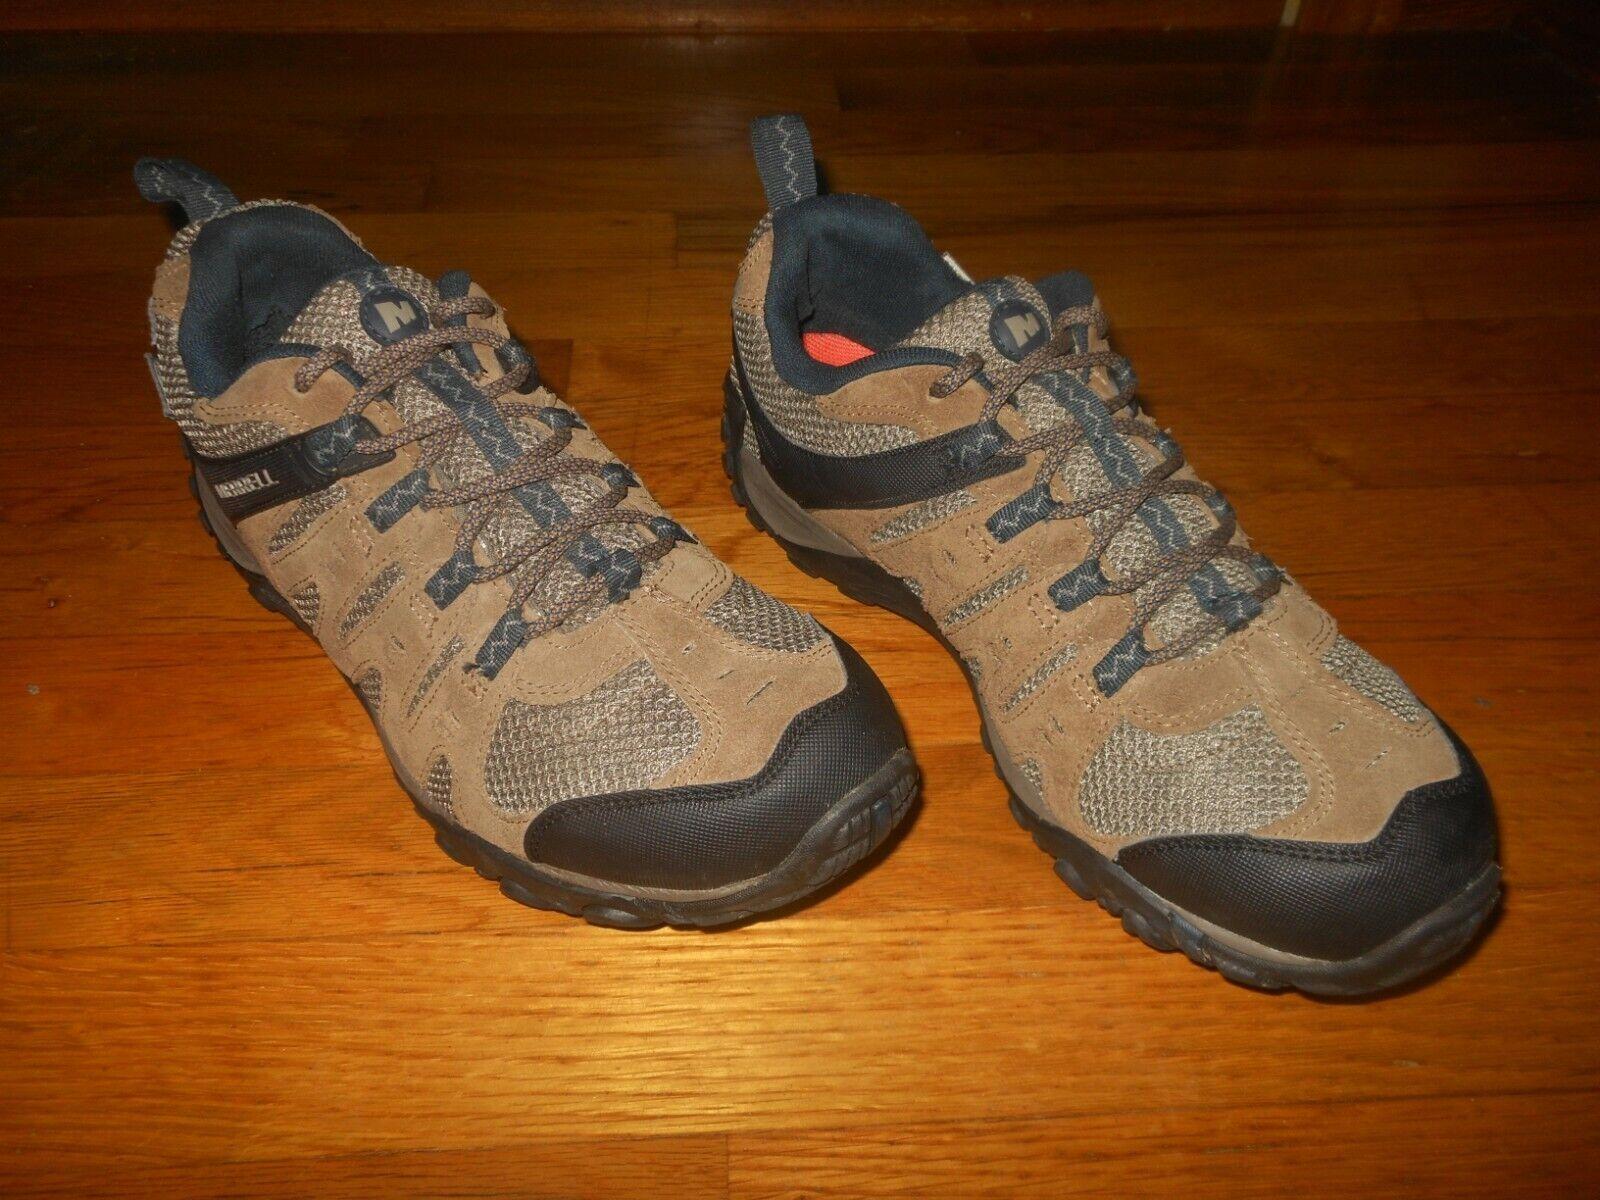 Accentor Waterproof Hiking Shoes Sz